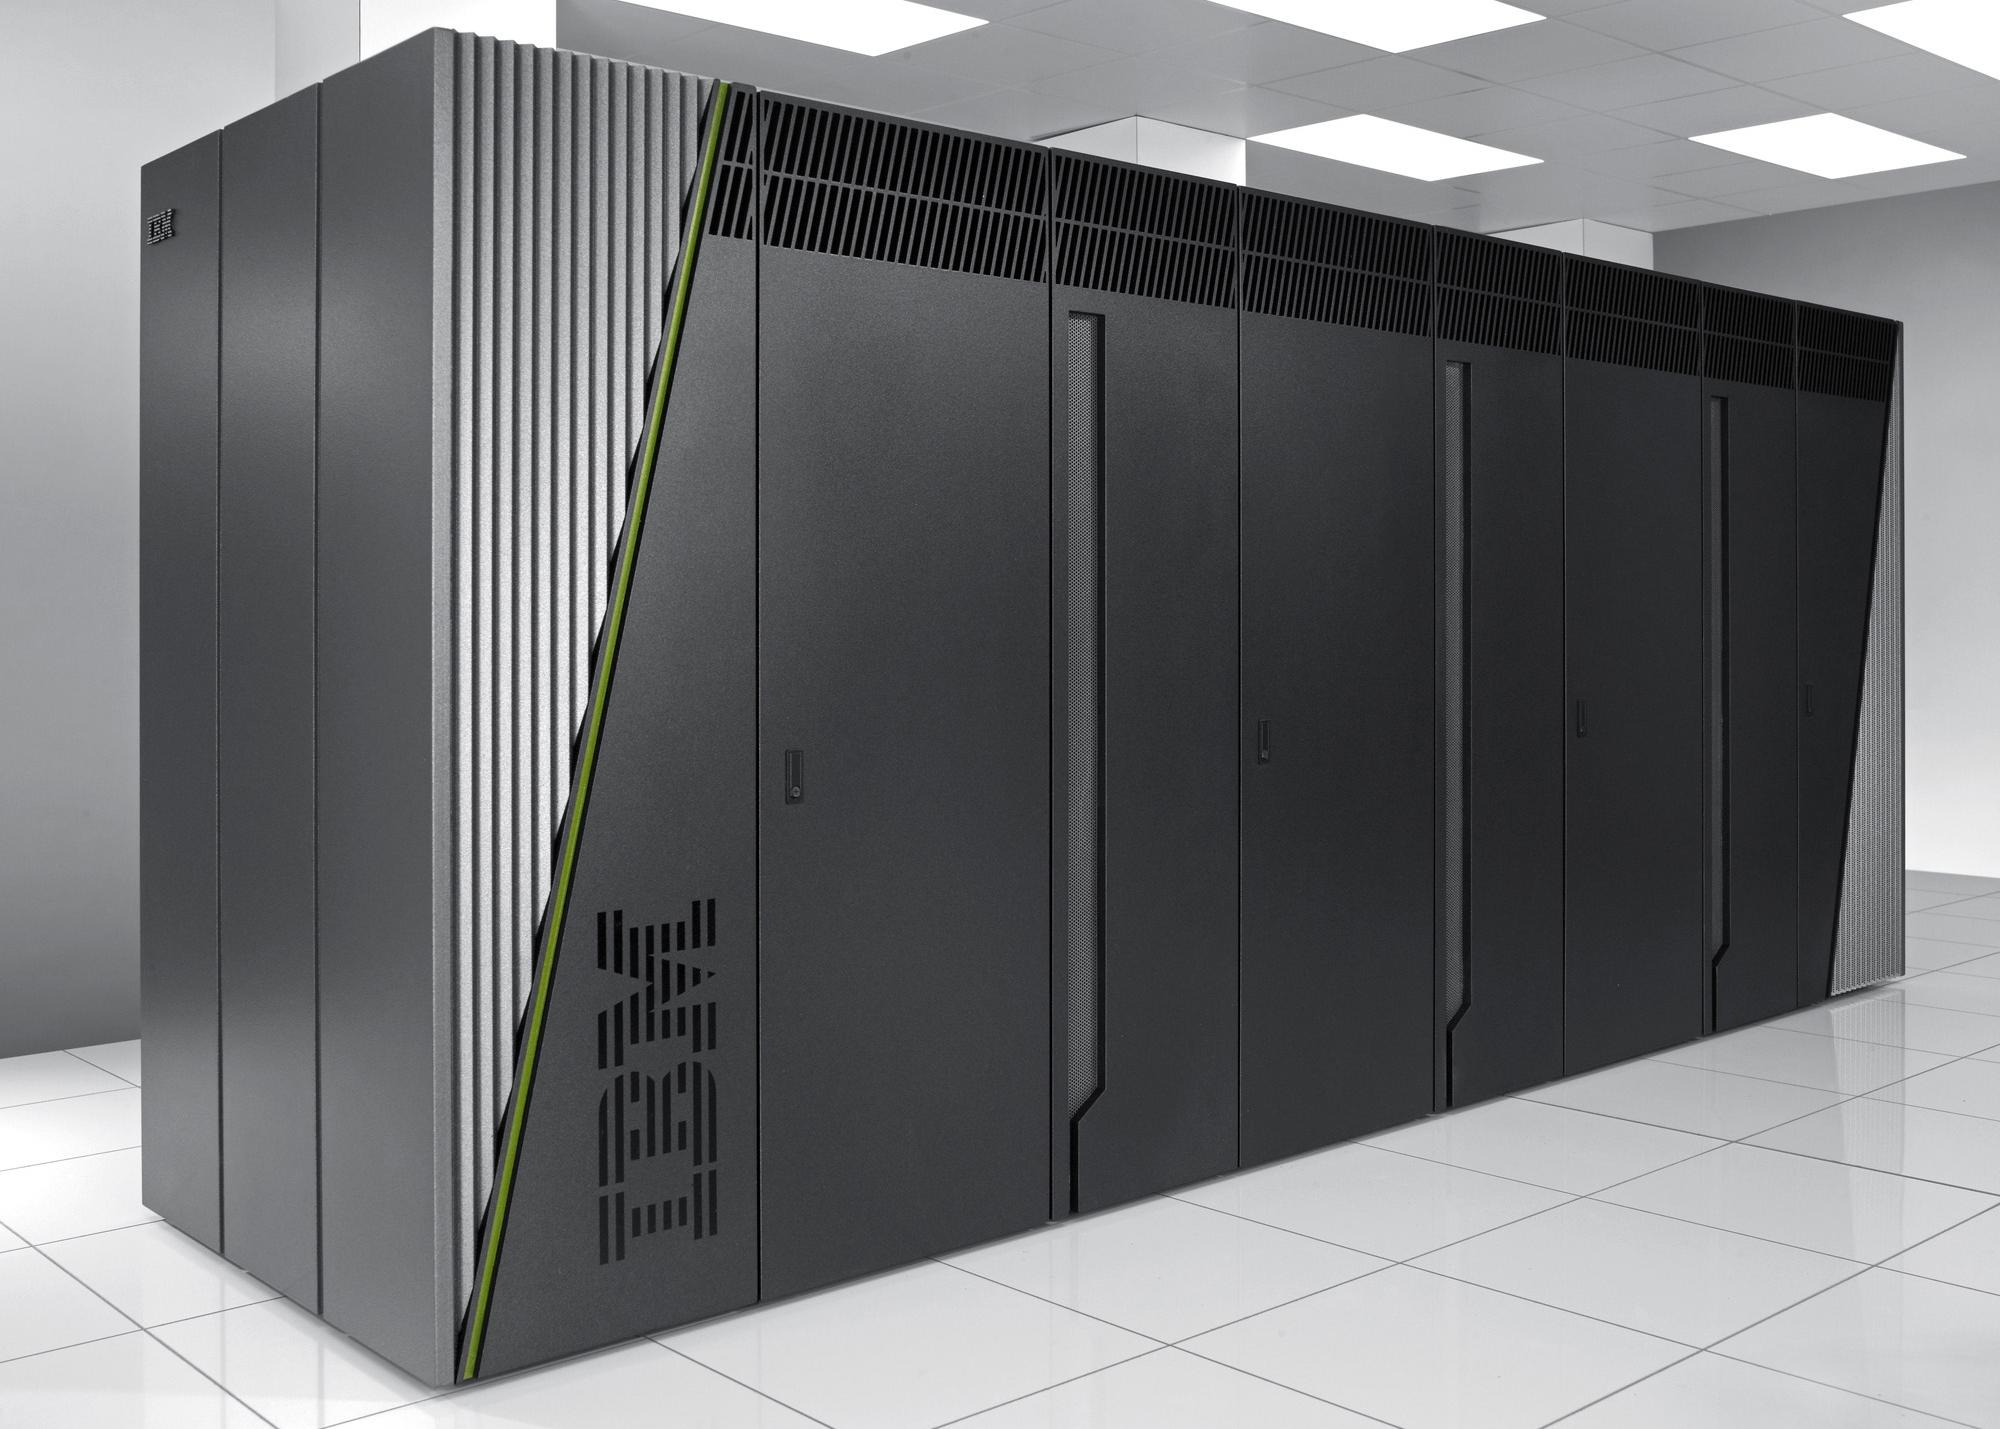 IBM's Sequoia supercomputer.